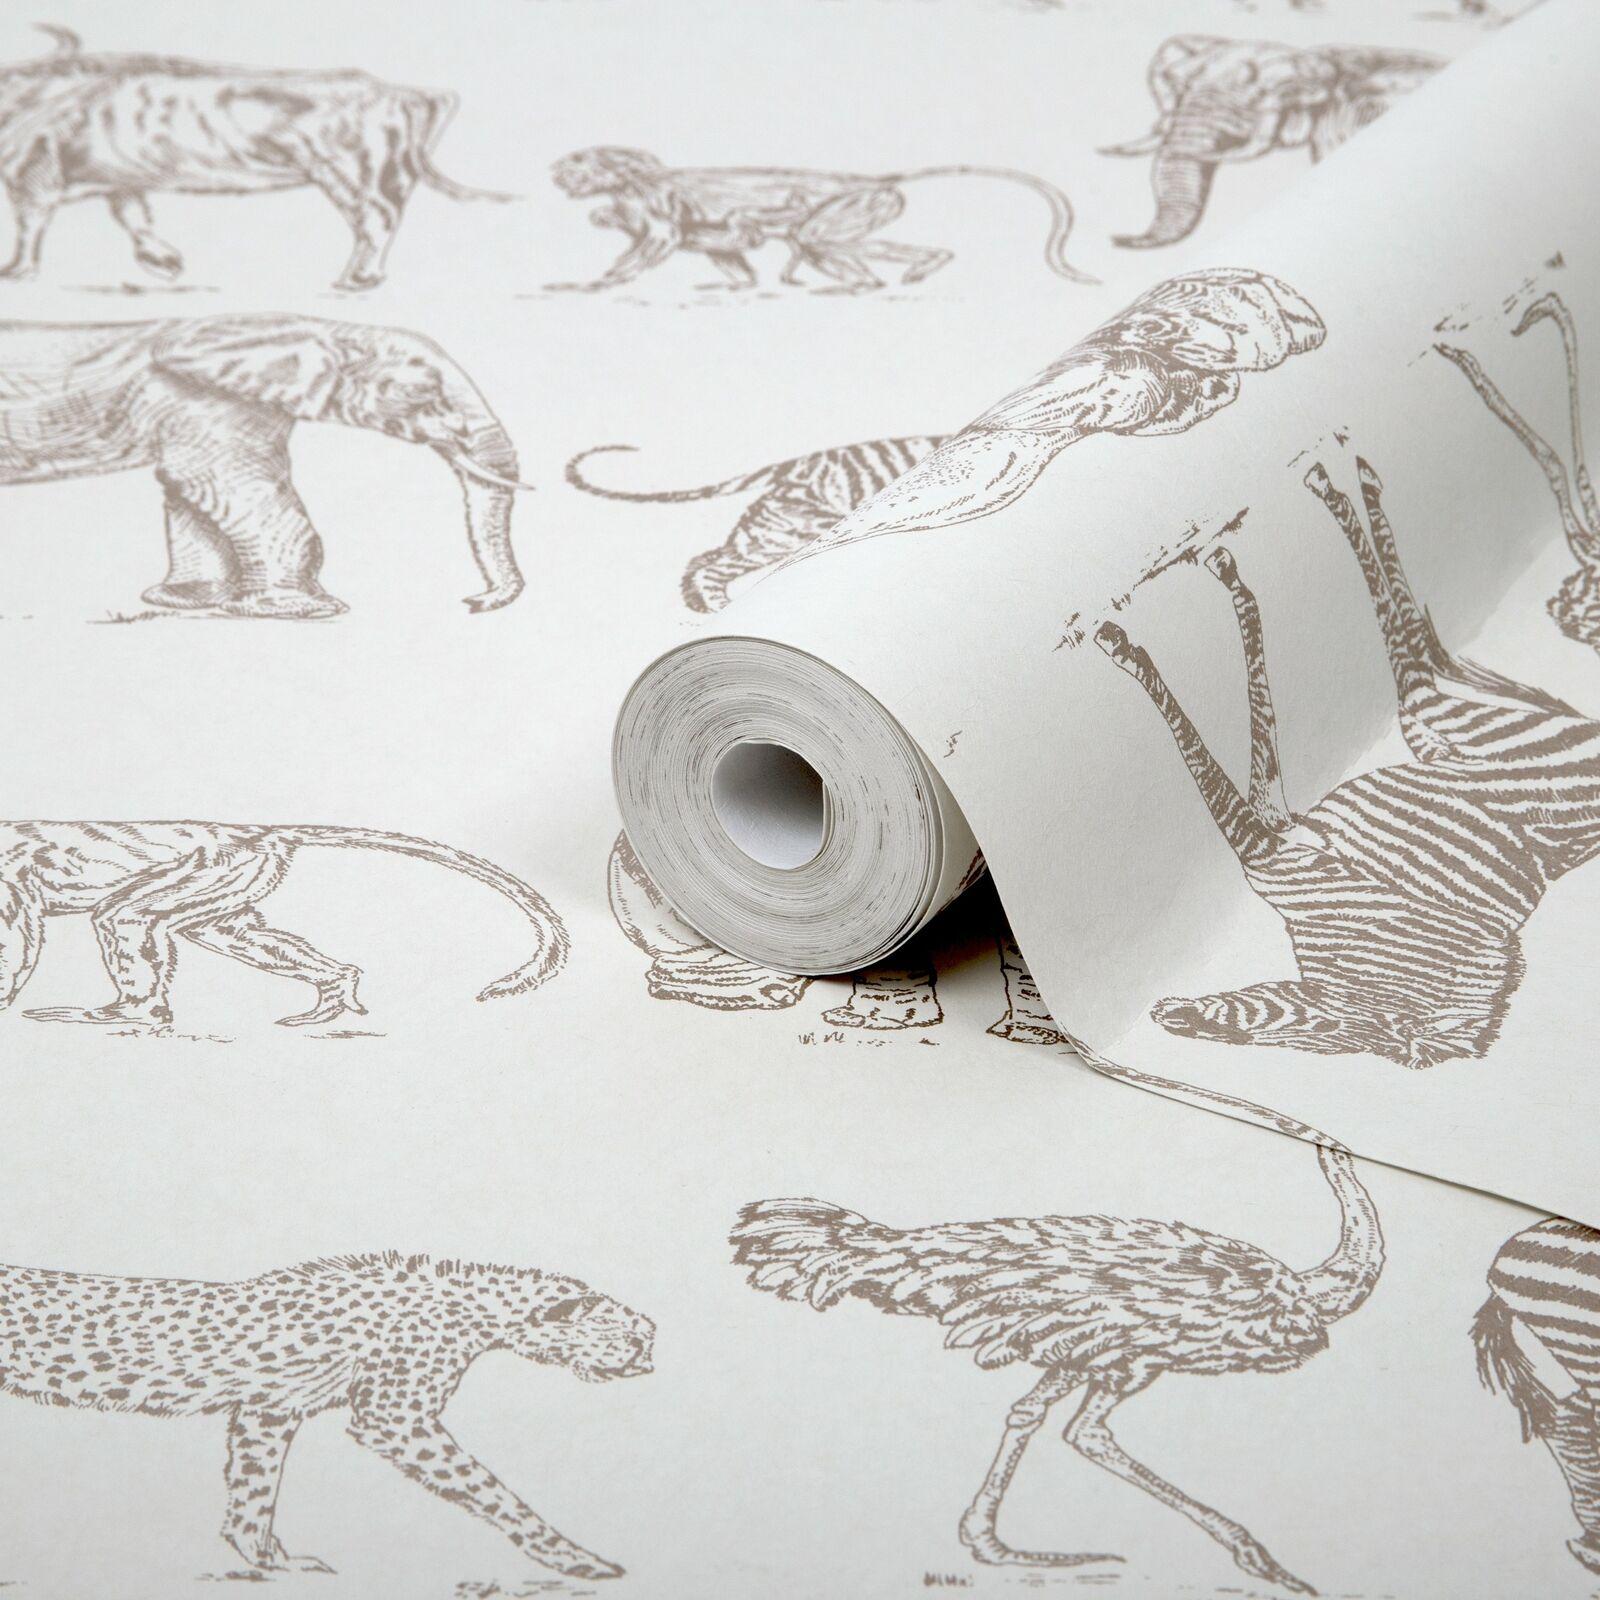 Safari Animal Motif Wallpaper Cream And Metallic Rose Gold